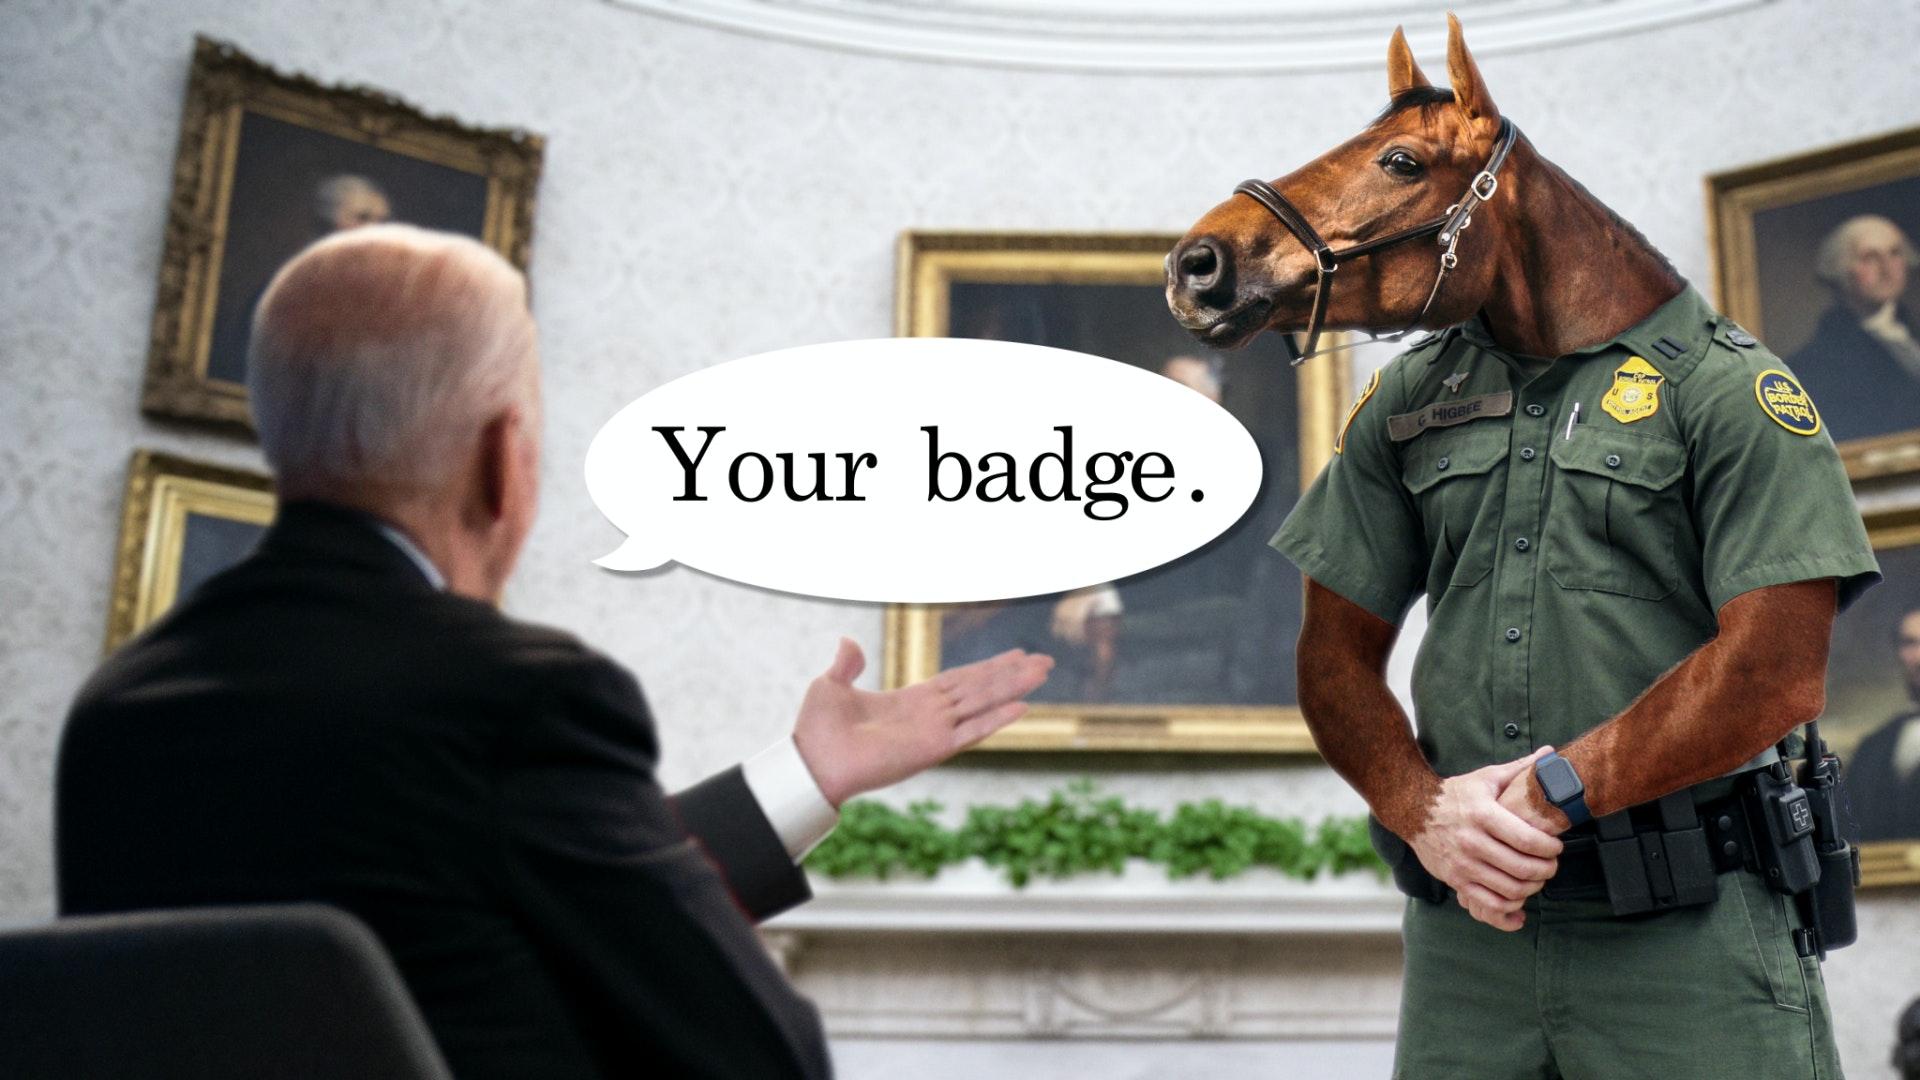 Ep. 1342 - Biden Shoots The Horses